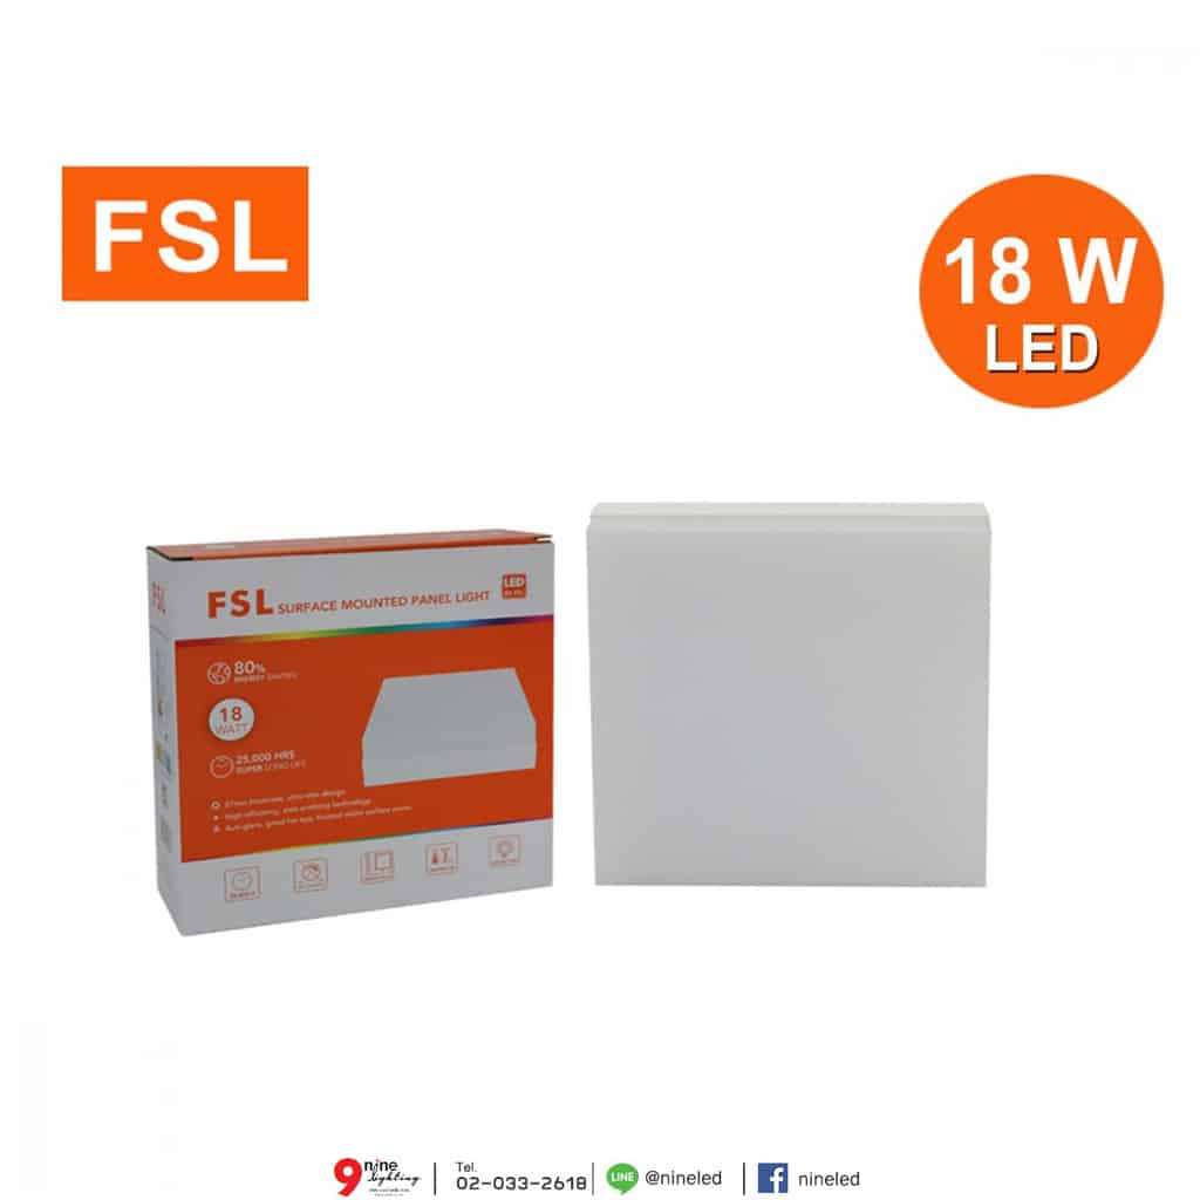 FSL 18w ติดลอยเหลี่ยม